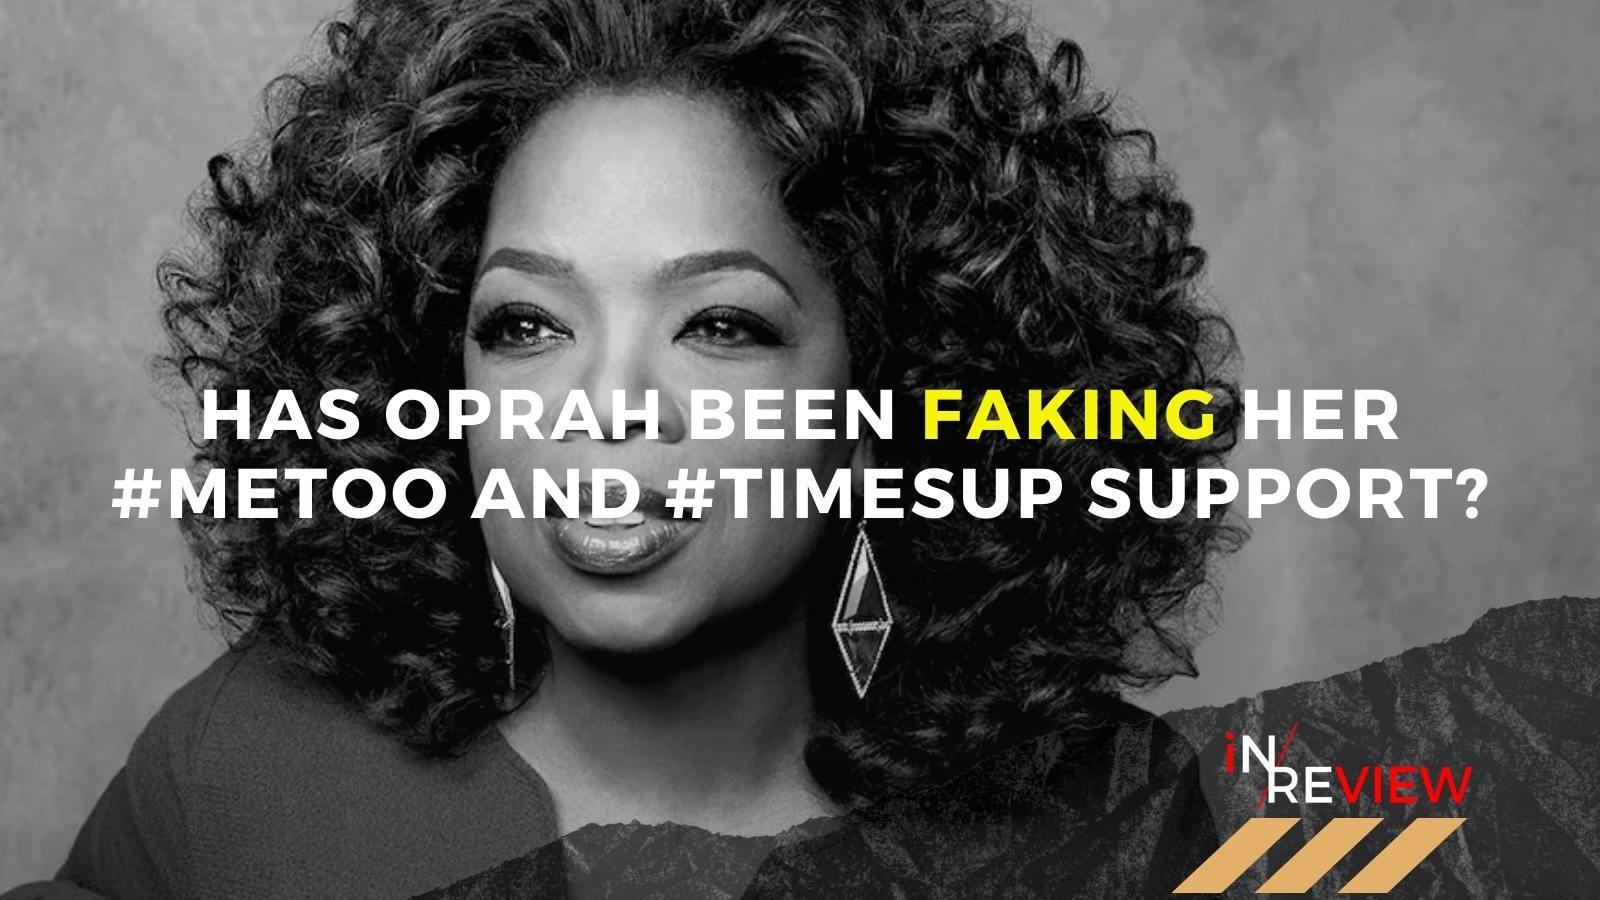 Oprah winfrey rose mcgowan oprah and rose me too times up hollywood harvey weinstein